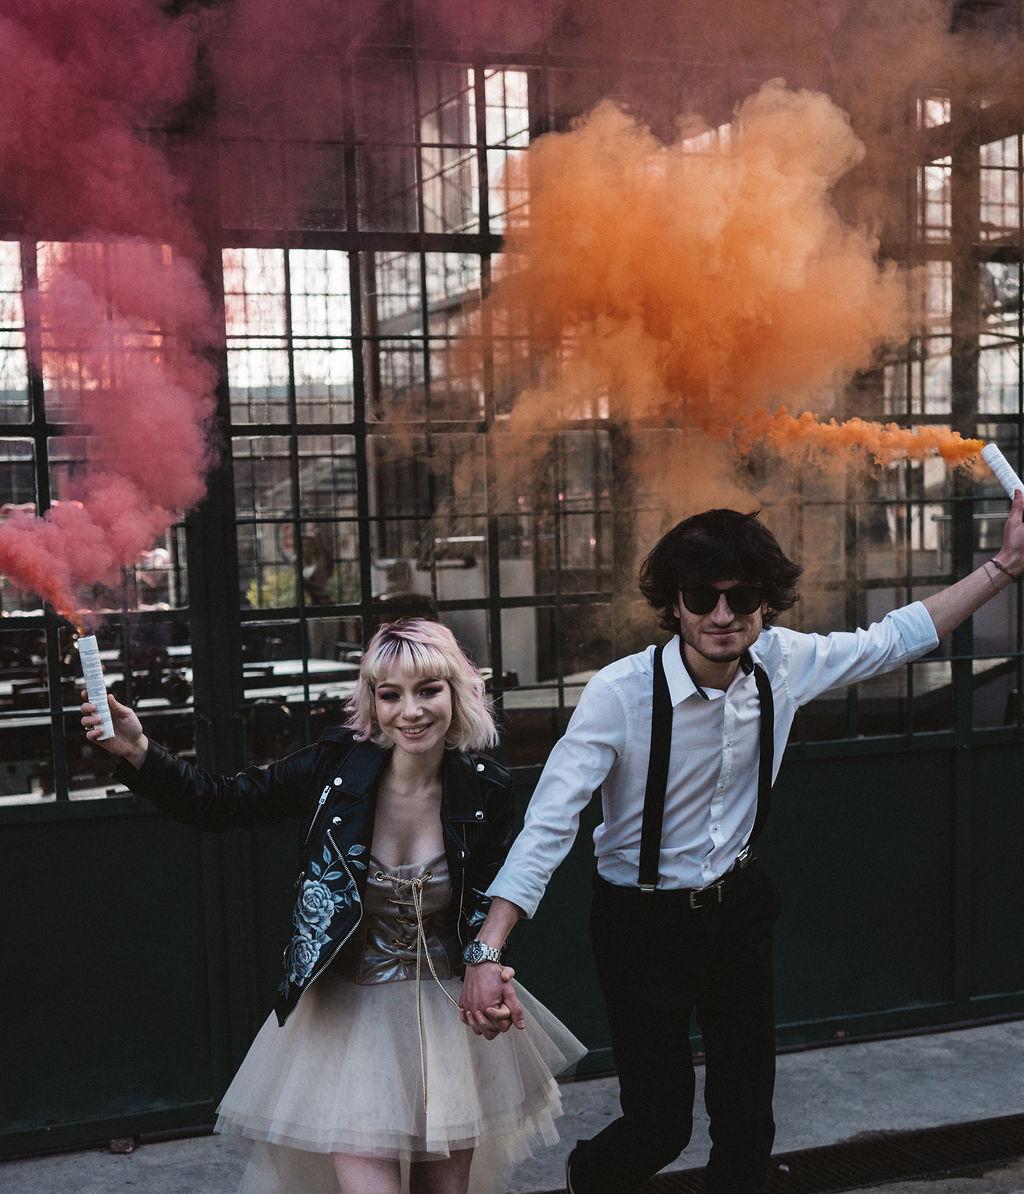 wedding smoke bomb - modern industrial wedding - alternative wedding - unconventional wedding - edgy wedding - rock and roll wedding